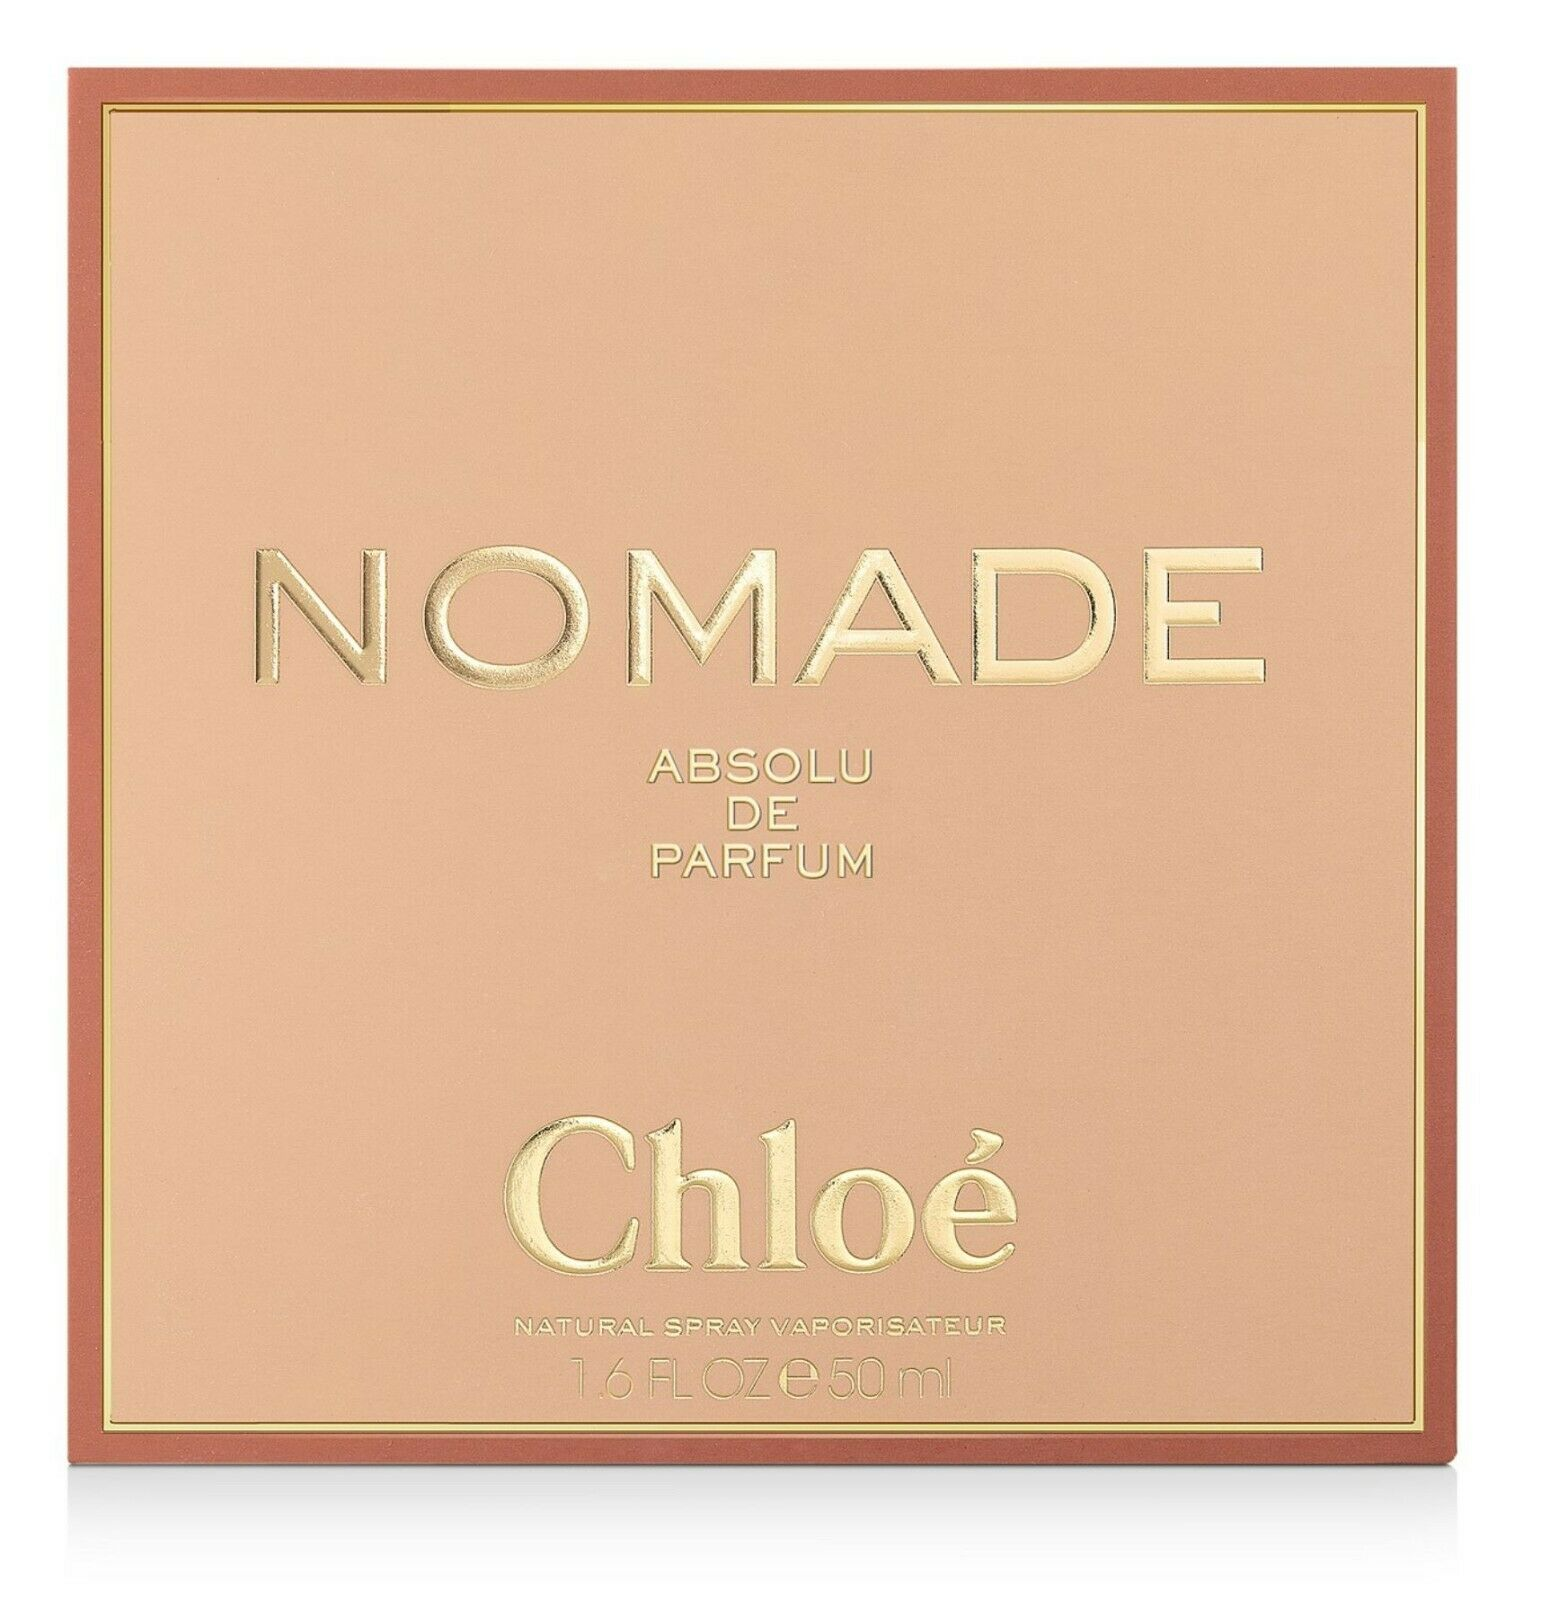 CHLOE NOMADE ABSOLU DE PARFUM 50 ml e 1.6 FL.OZ - NEW 2020 SEALED 100% AUTHENTIC